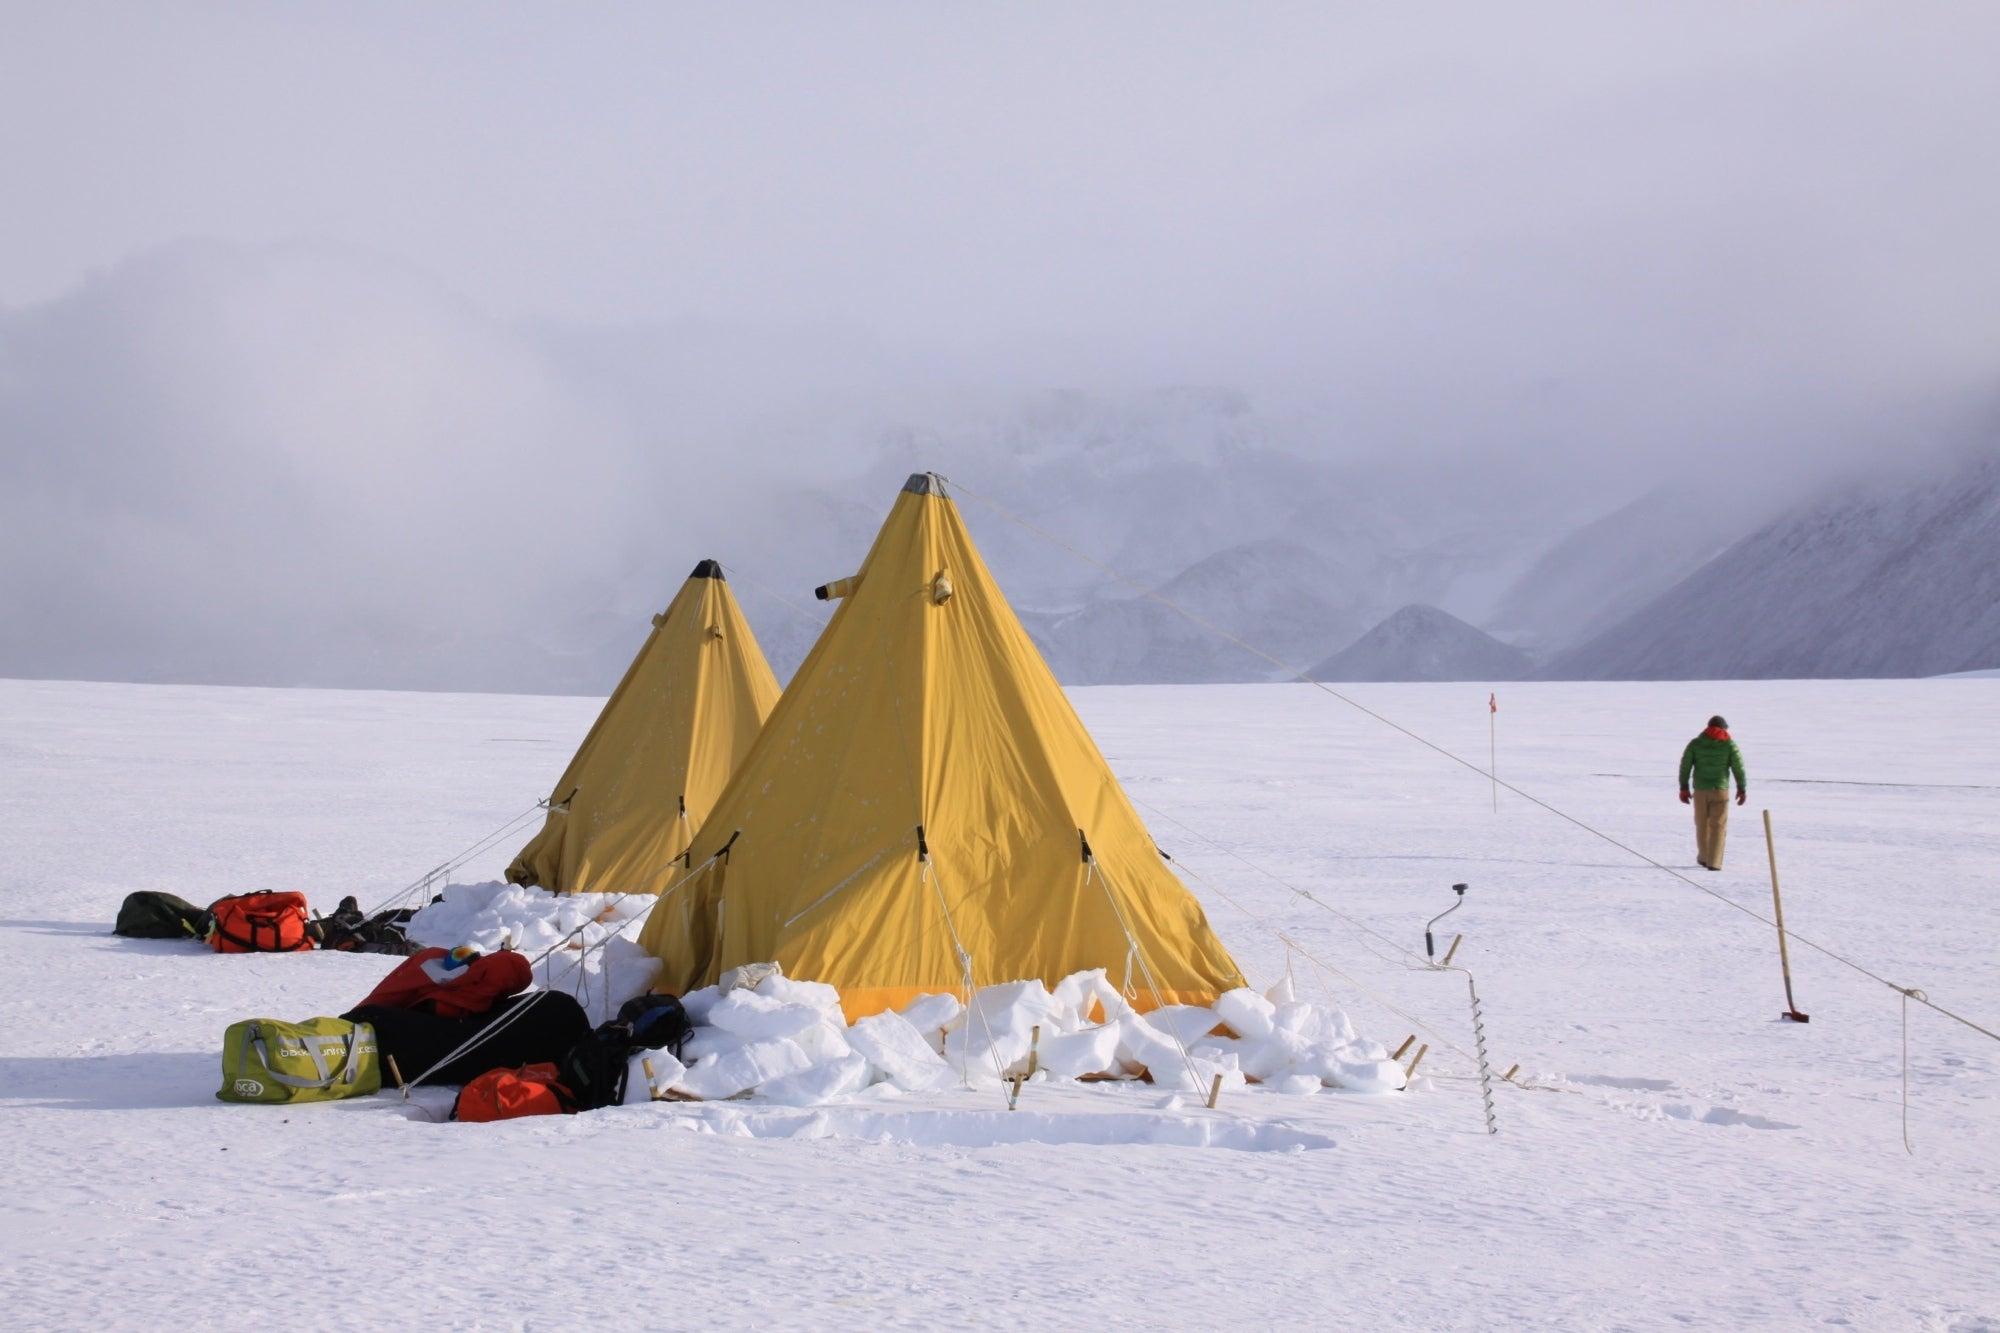 Antarctica Week Part 1: Behind The Scenes In A Remote Field Camp